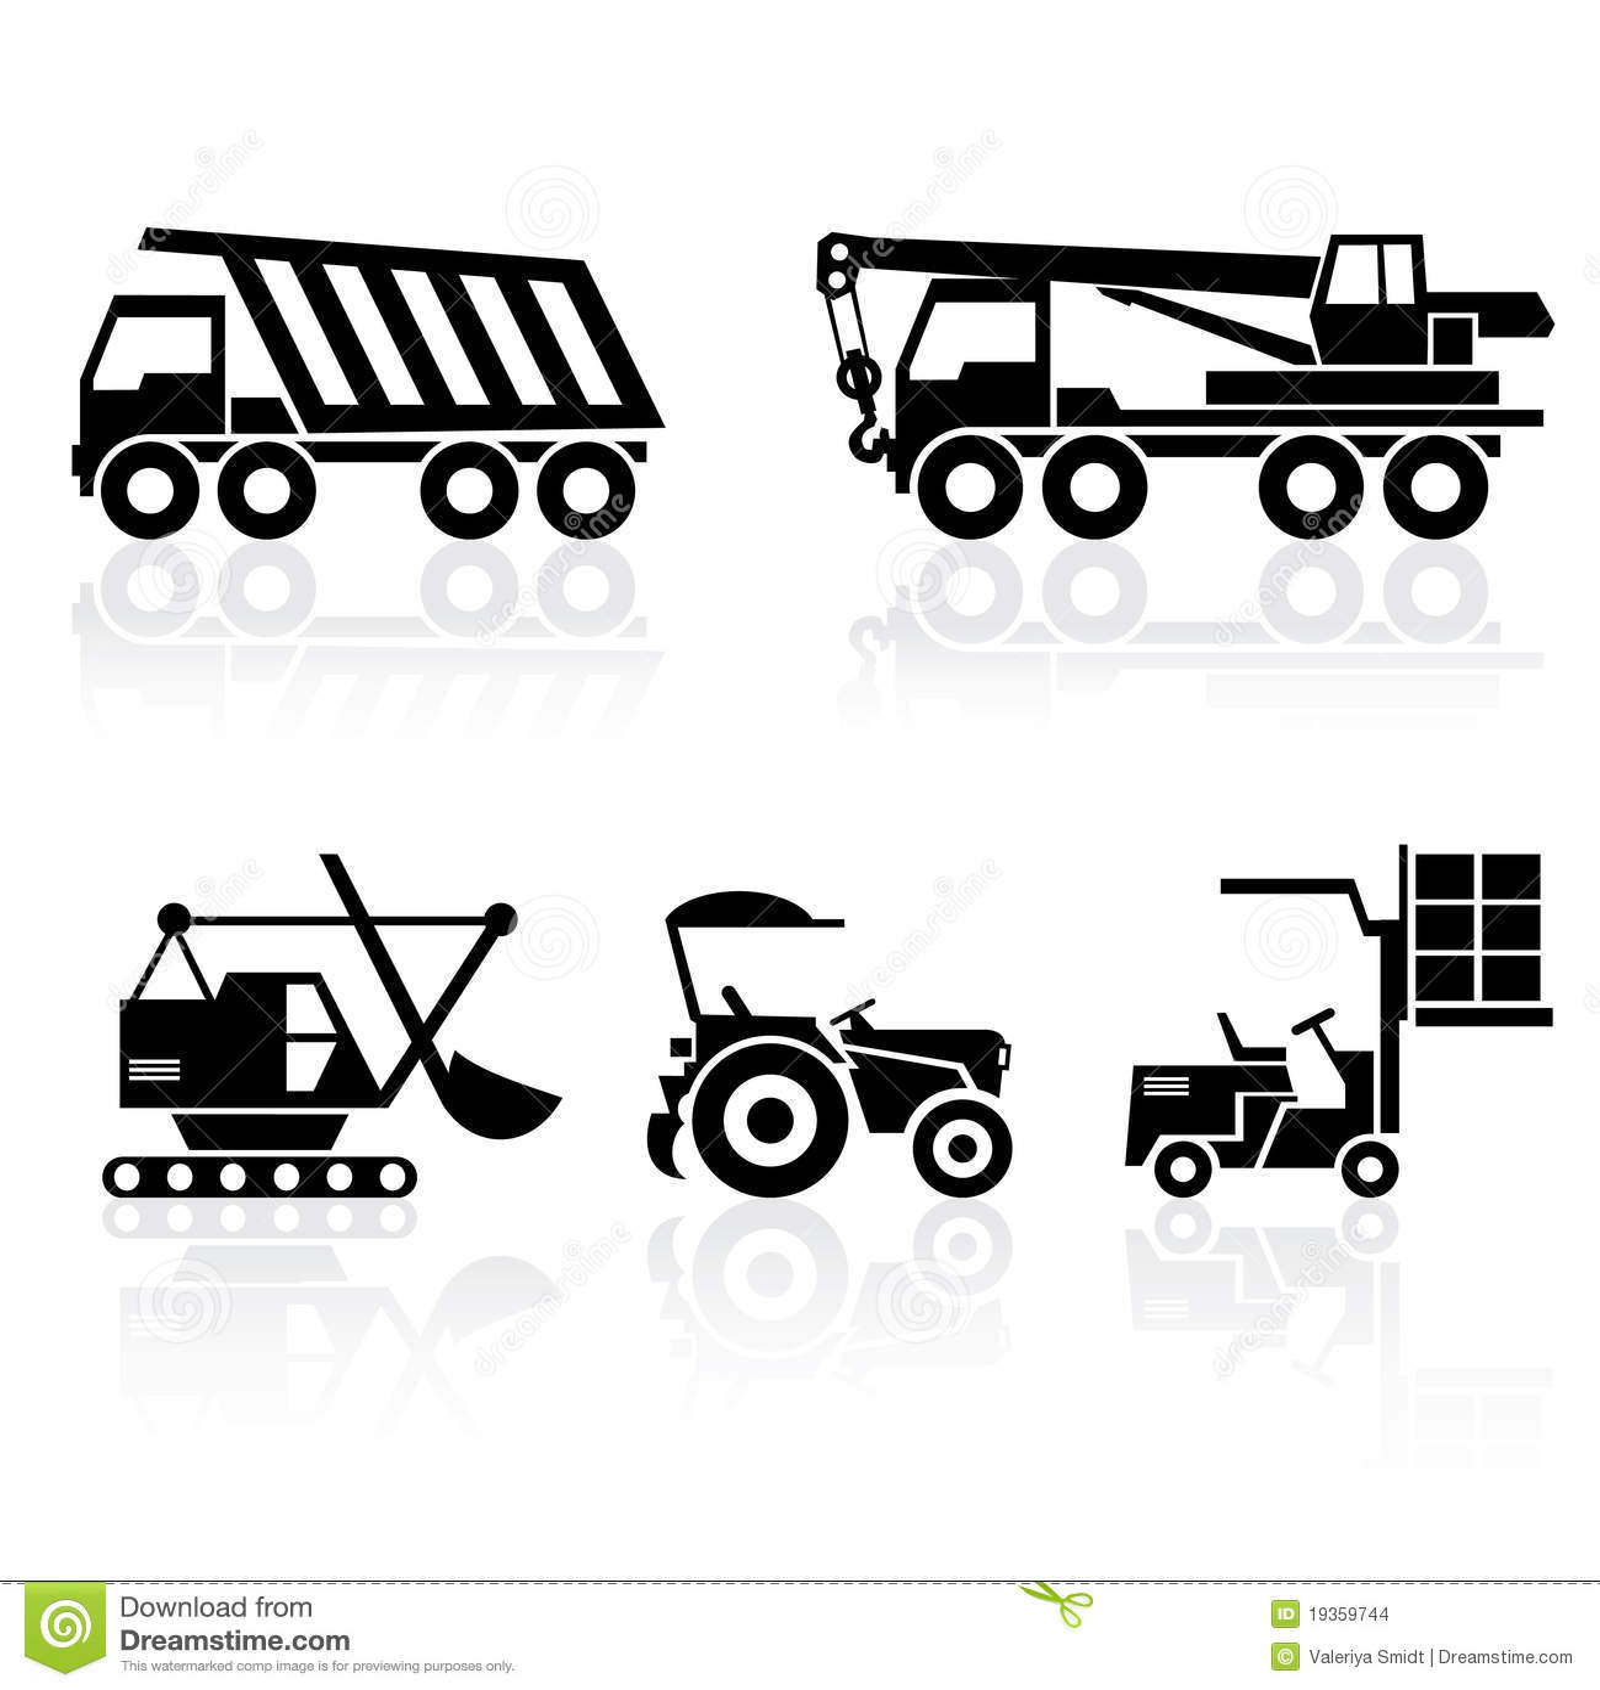 Veículos especiais